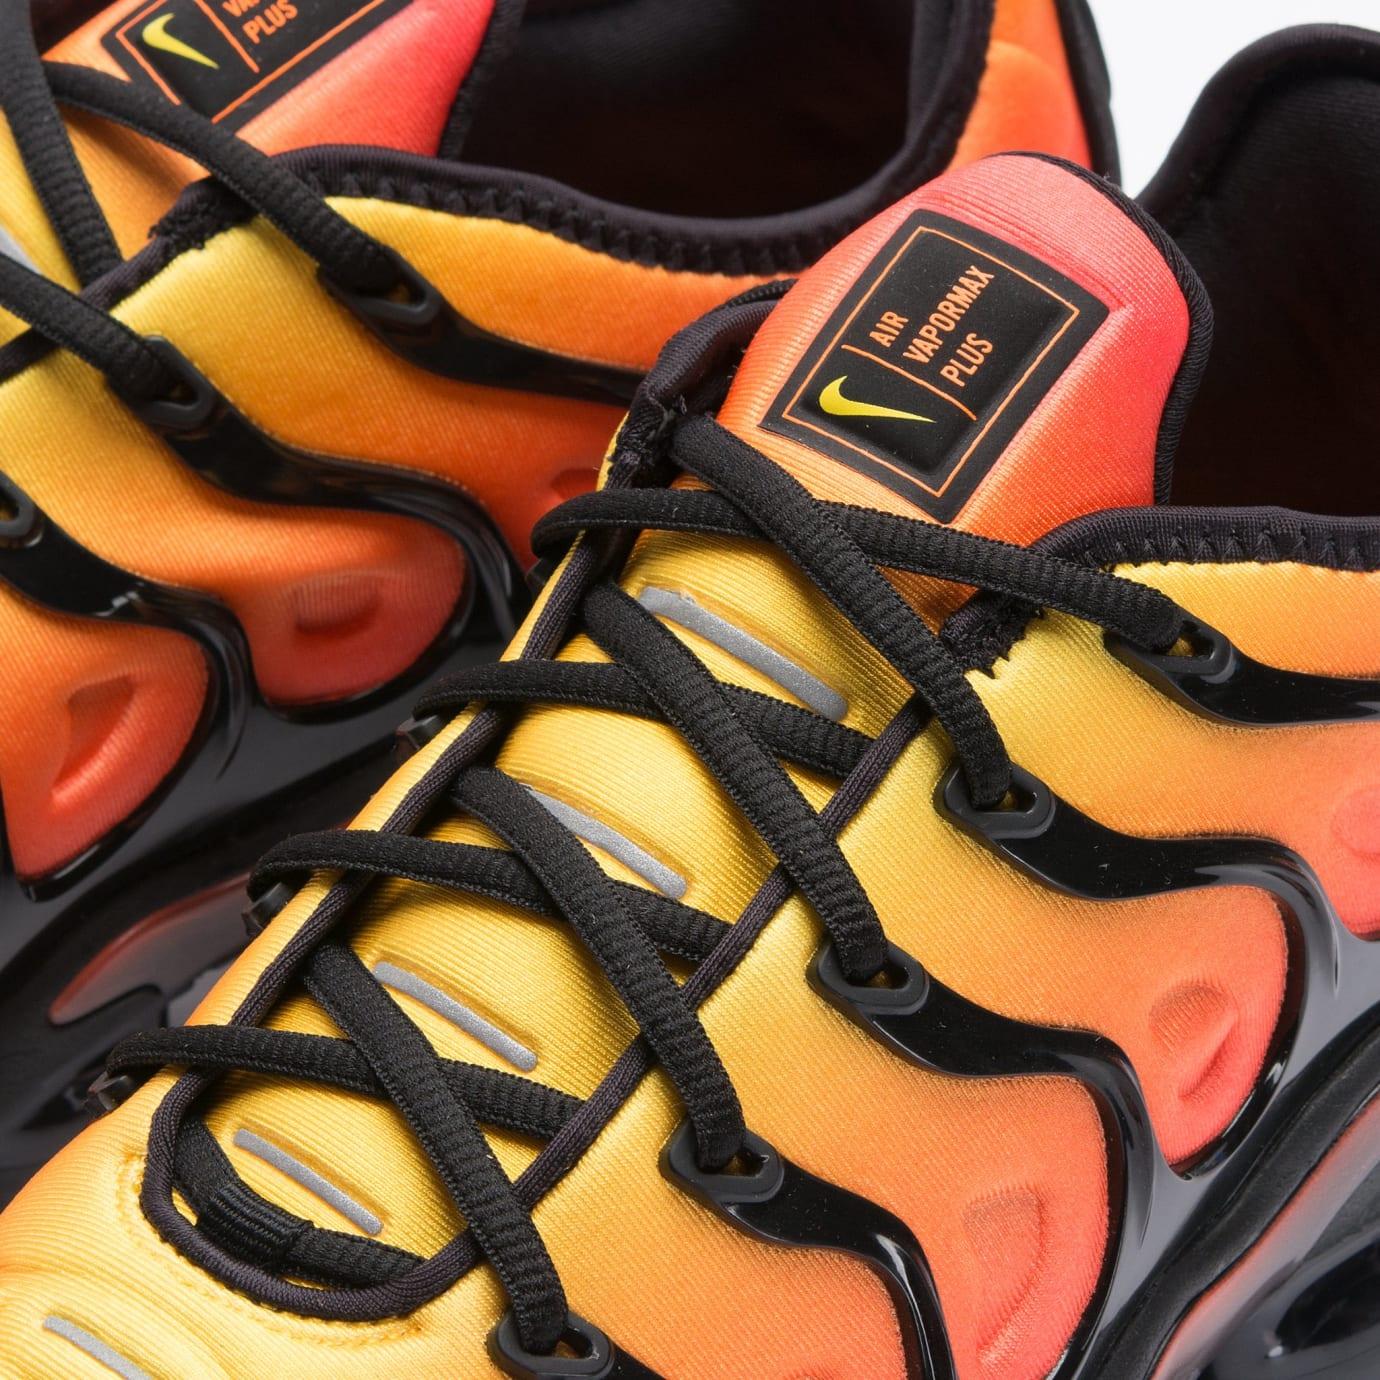 official photos 13695 871b4 Nike VaporMax Plus 'Sunset' Black/Total Orange Release Date ...